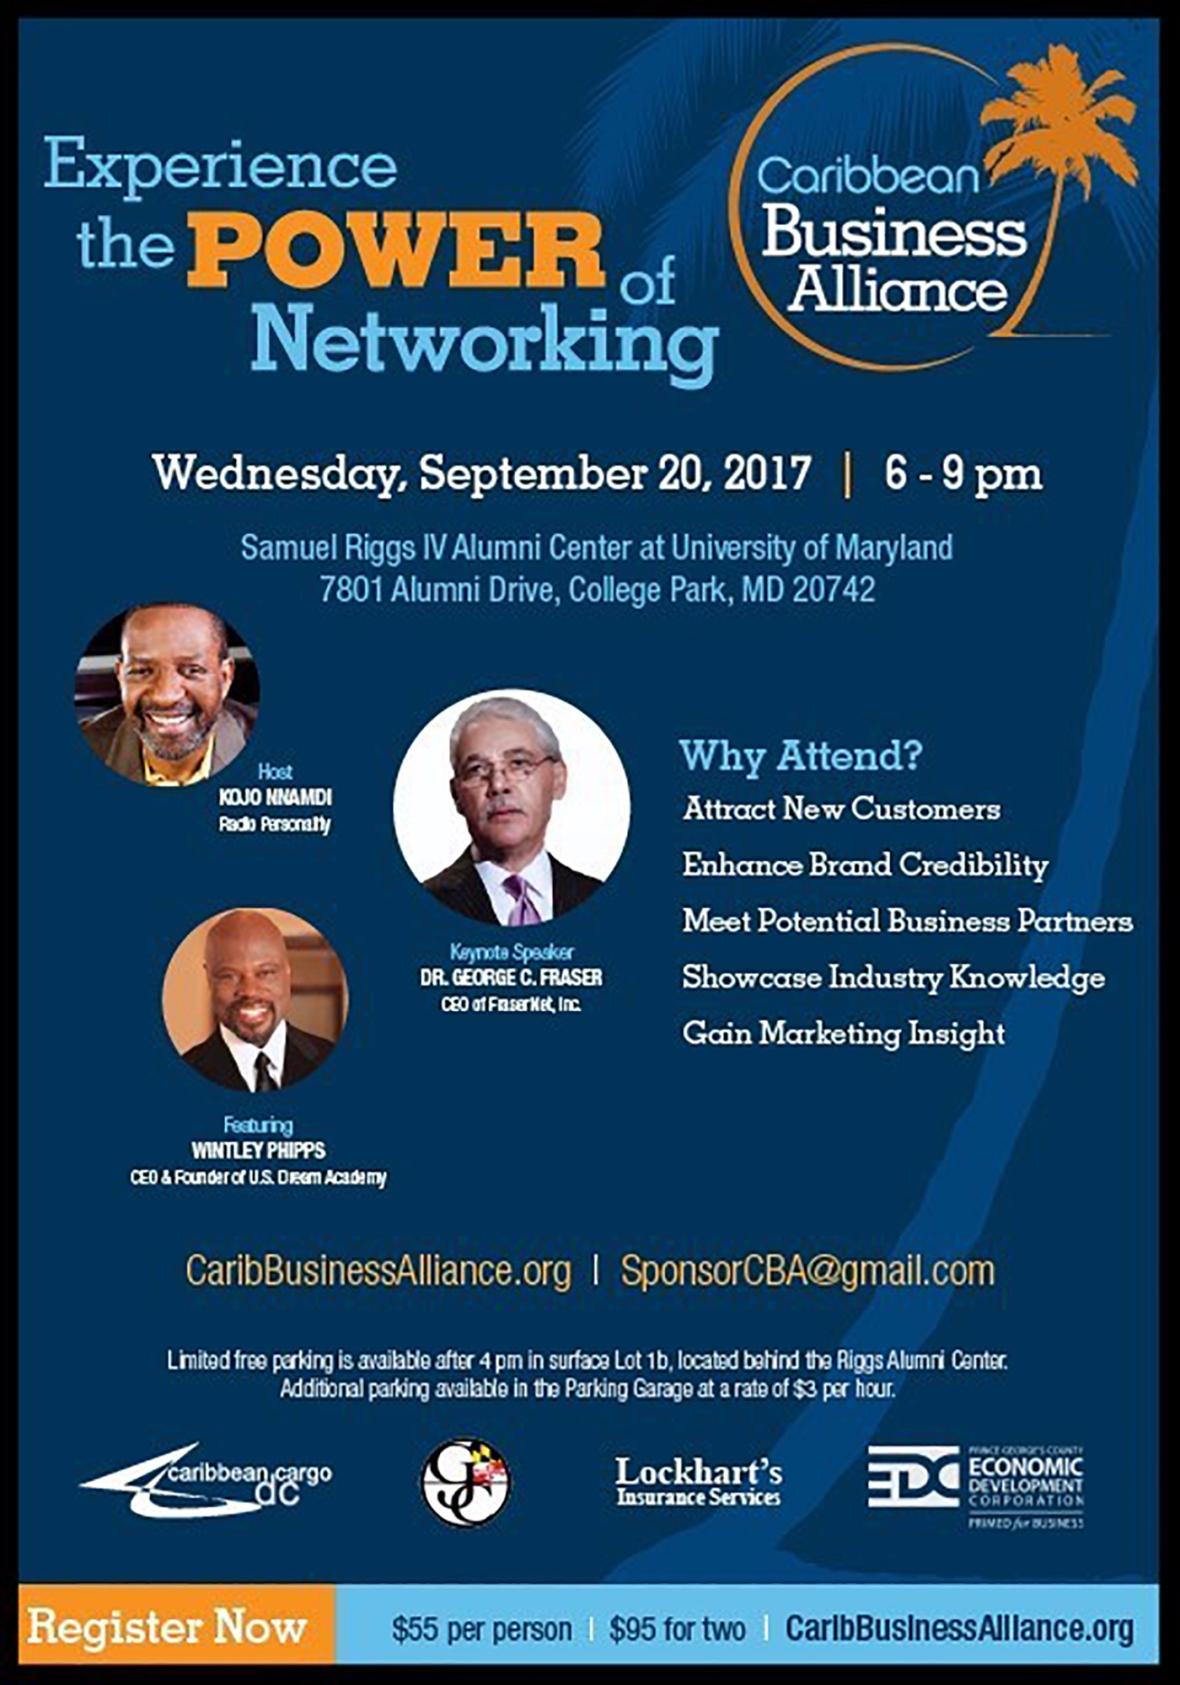 Caribbean Cargo Business Alliance